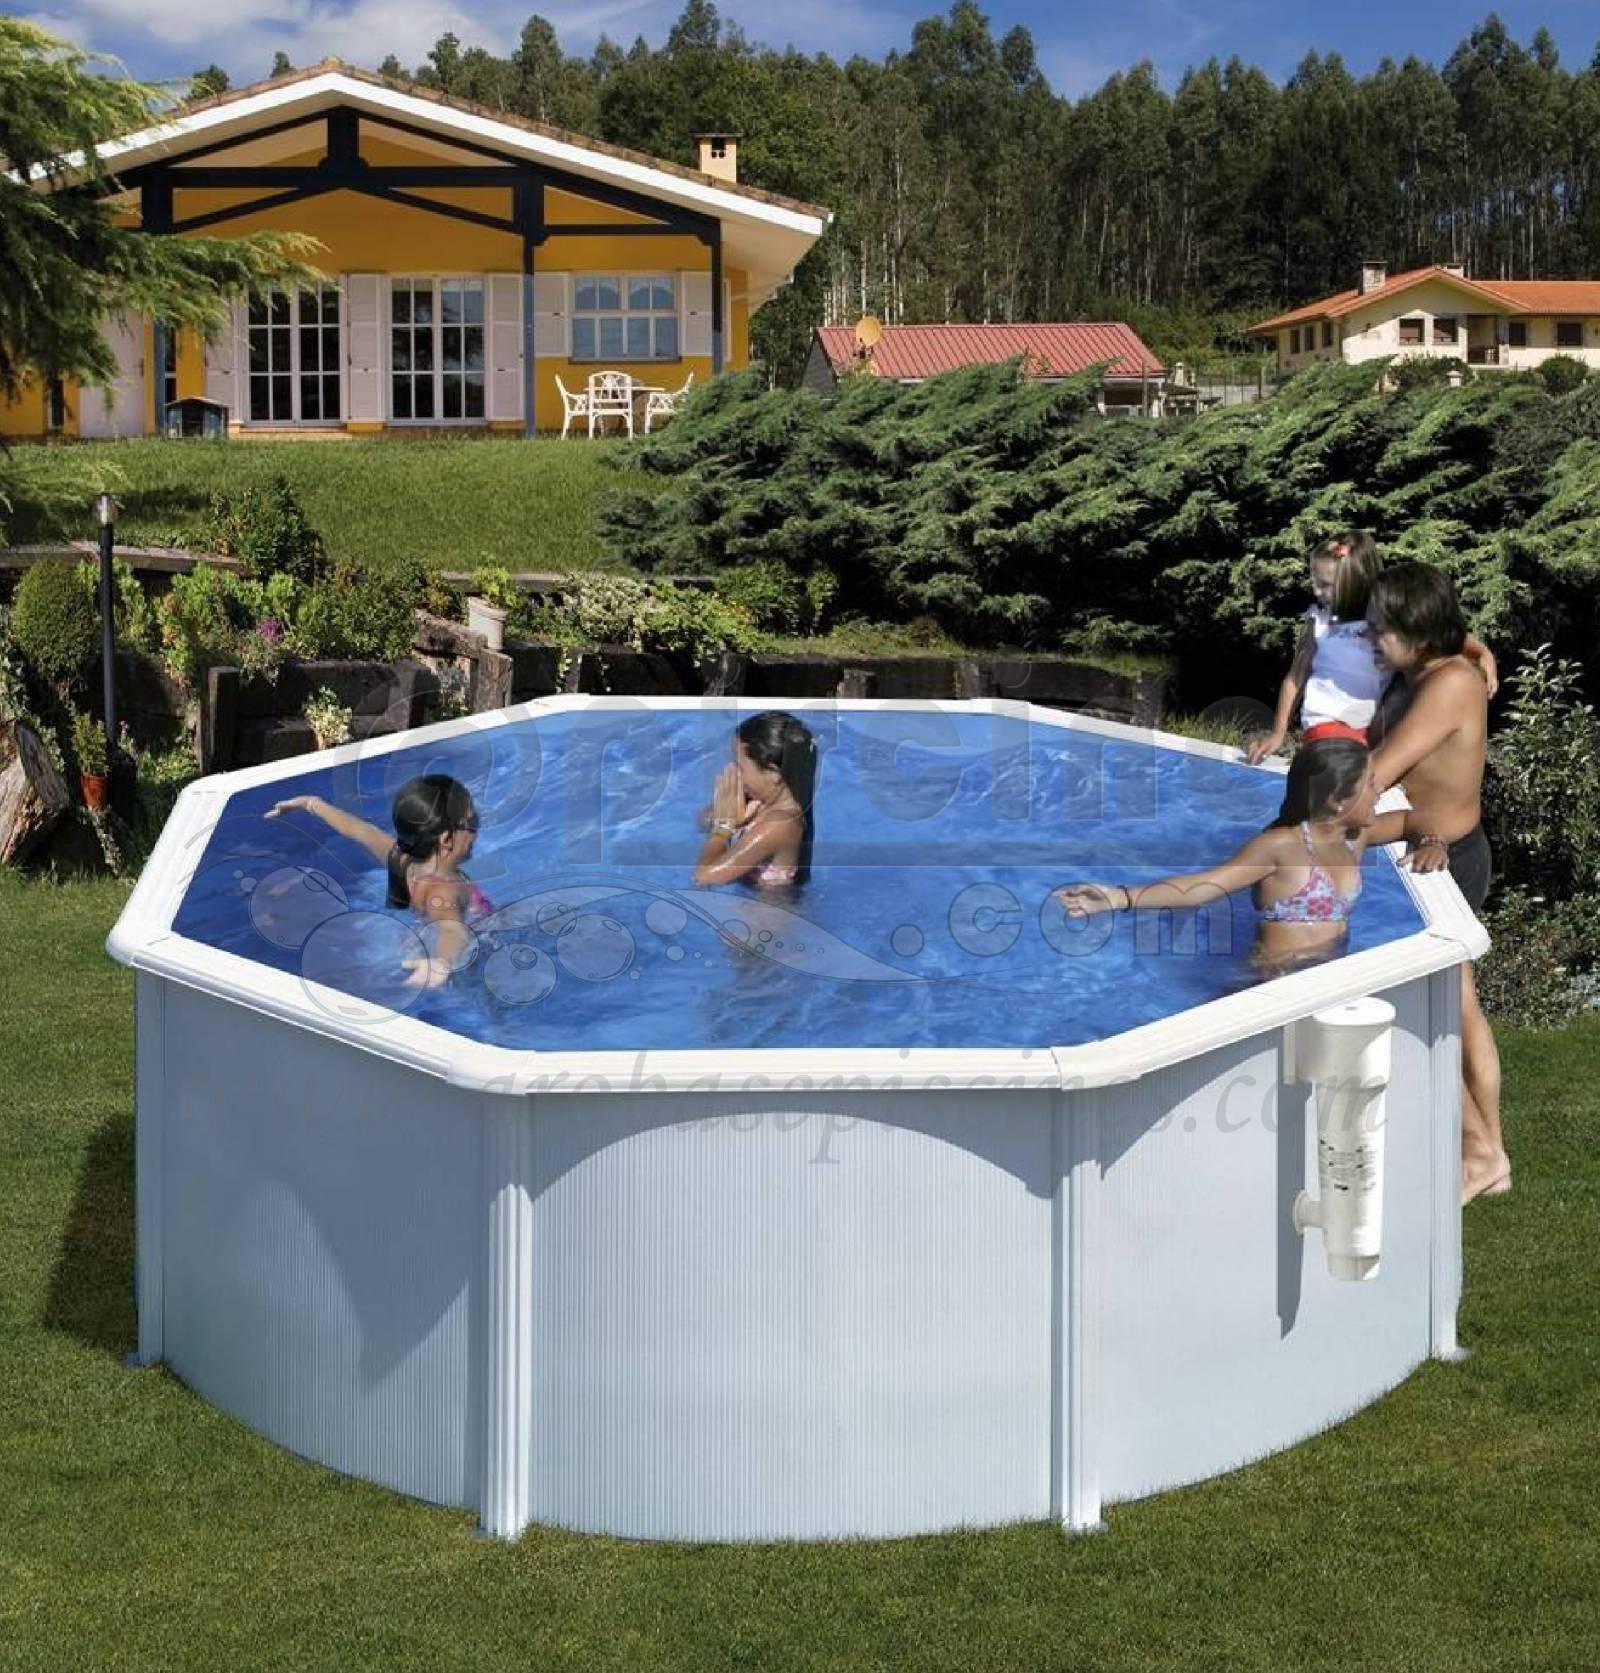 Piscine en kit hors sol ronde en acier 10,10m de diamÉtre piscine